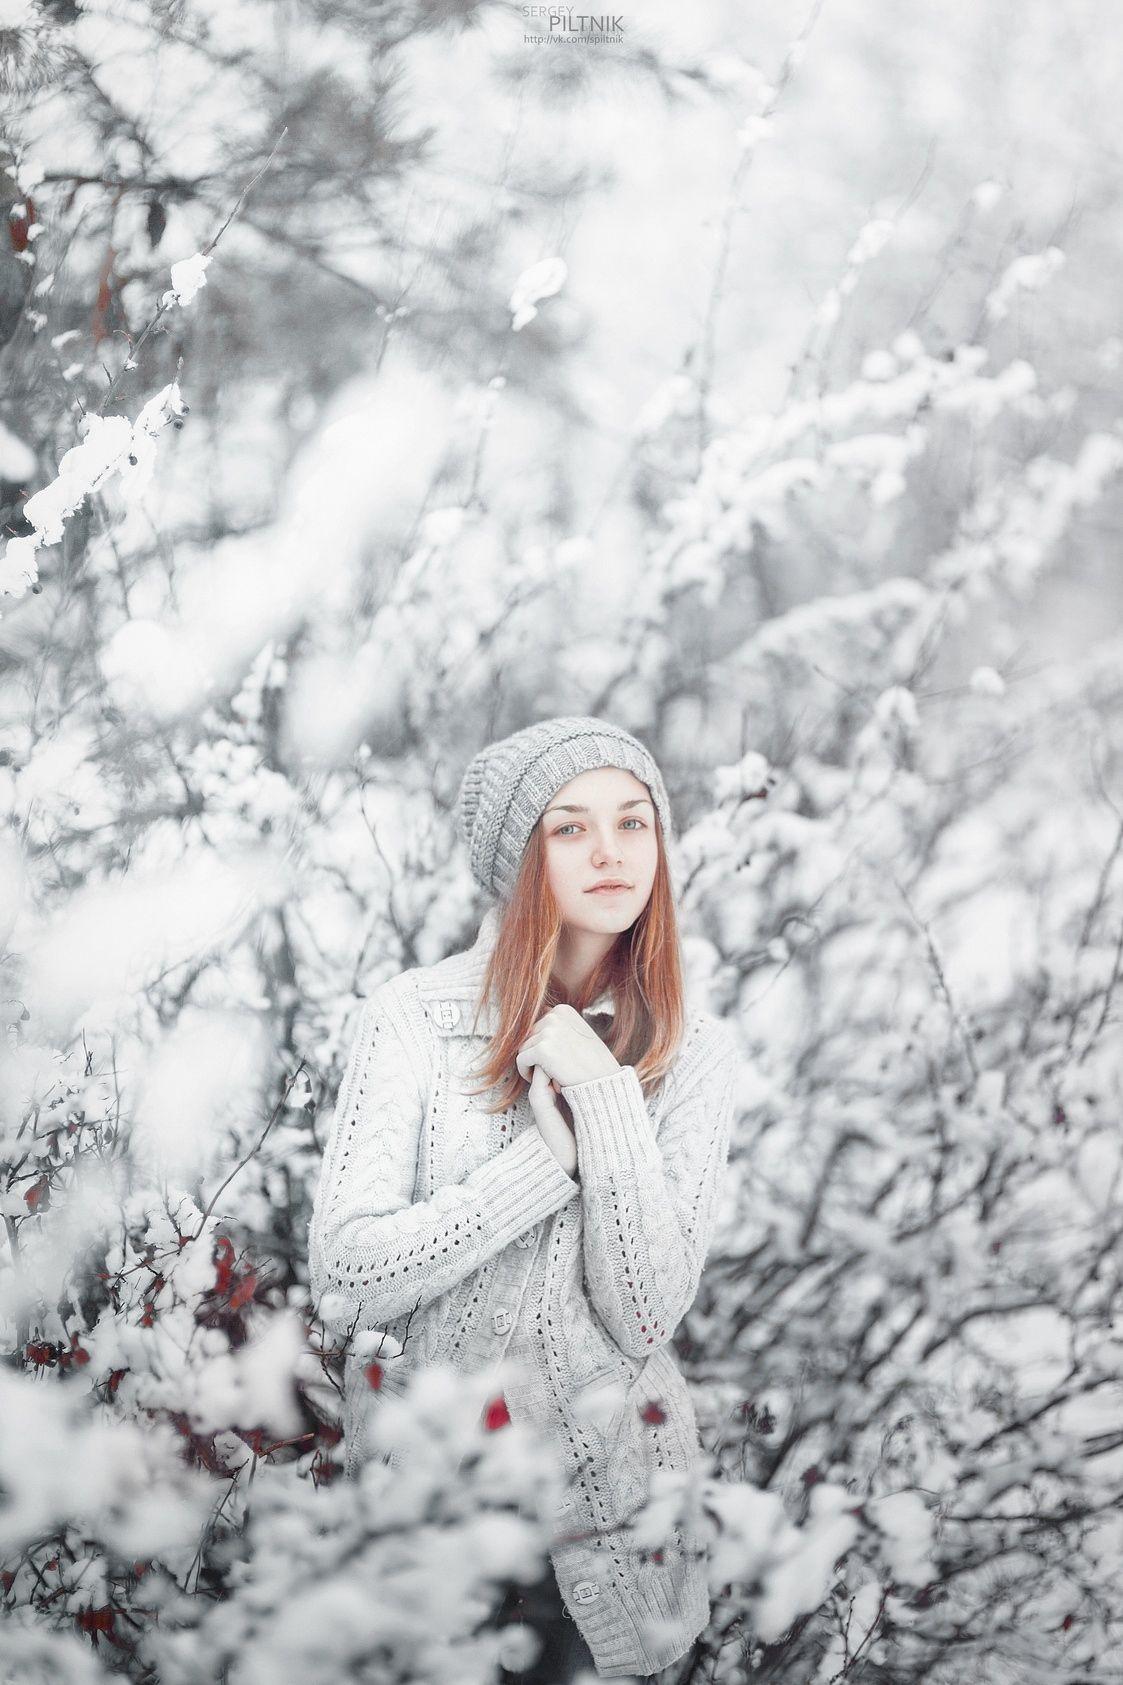 фотосъемка снега фото домой уже планируешь